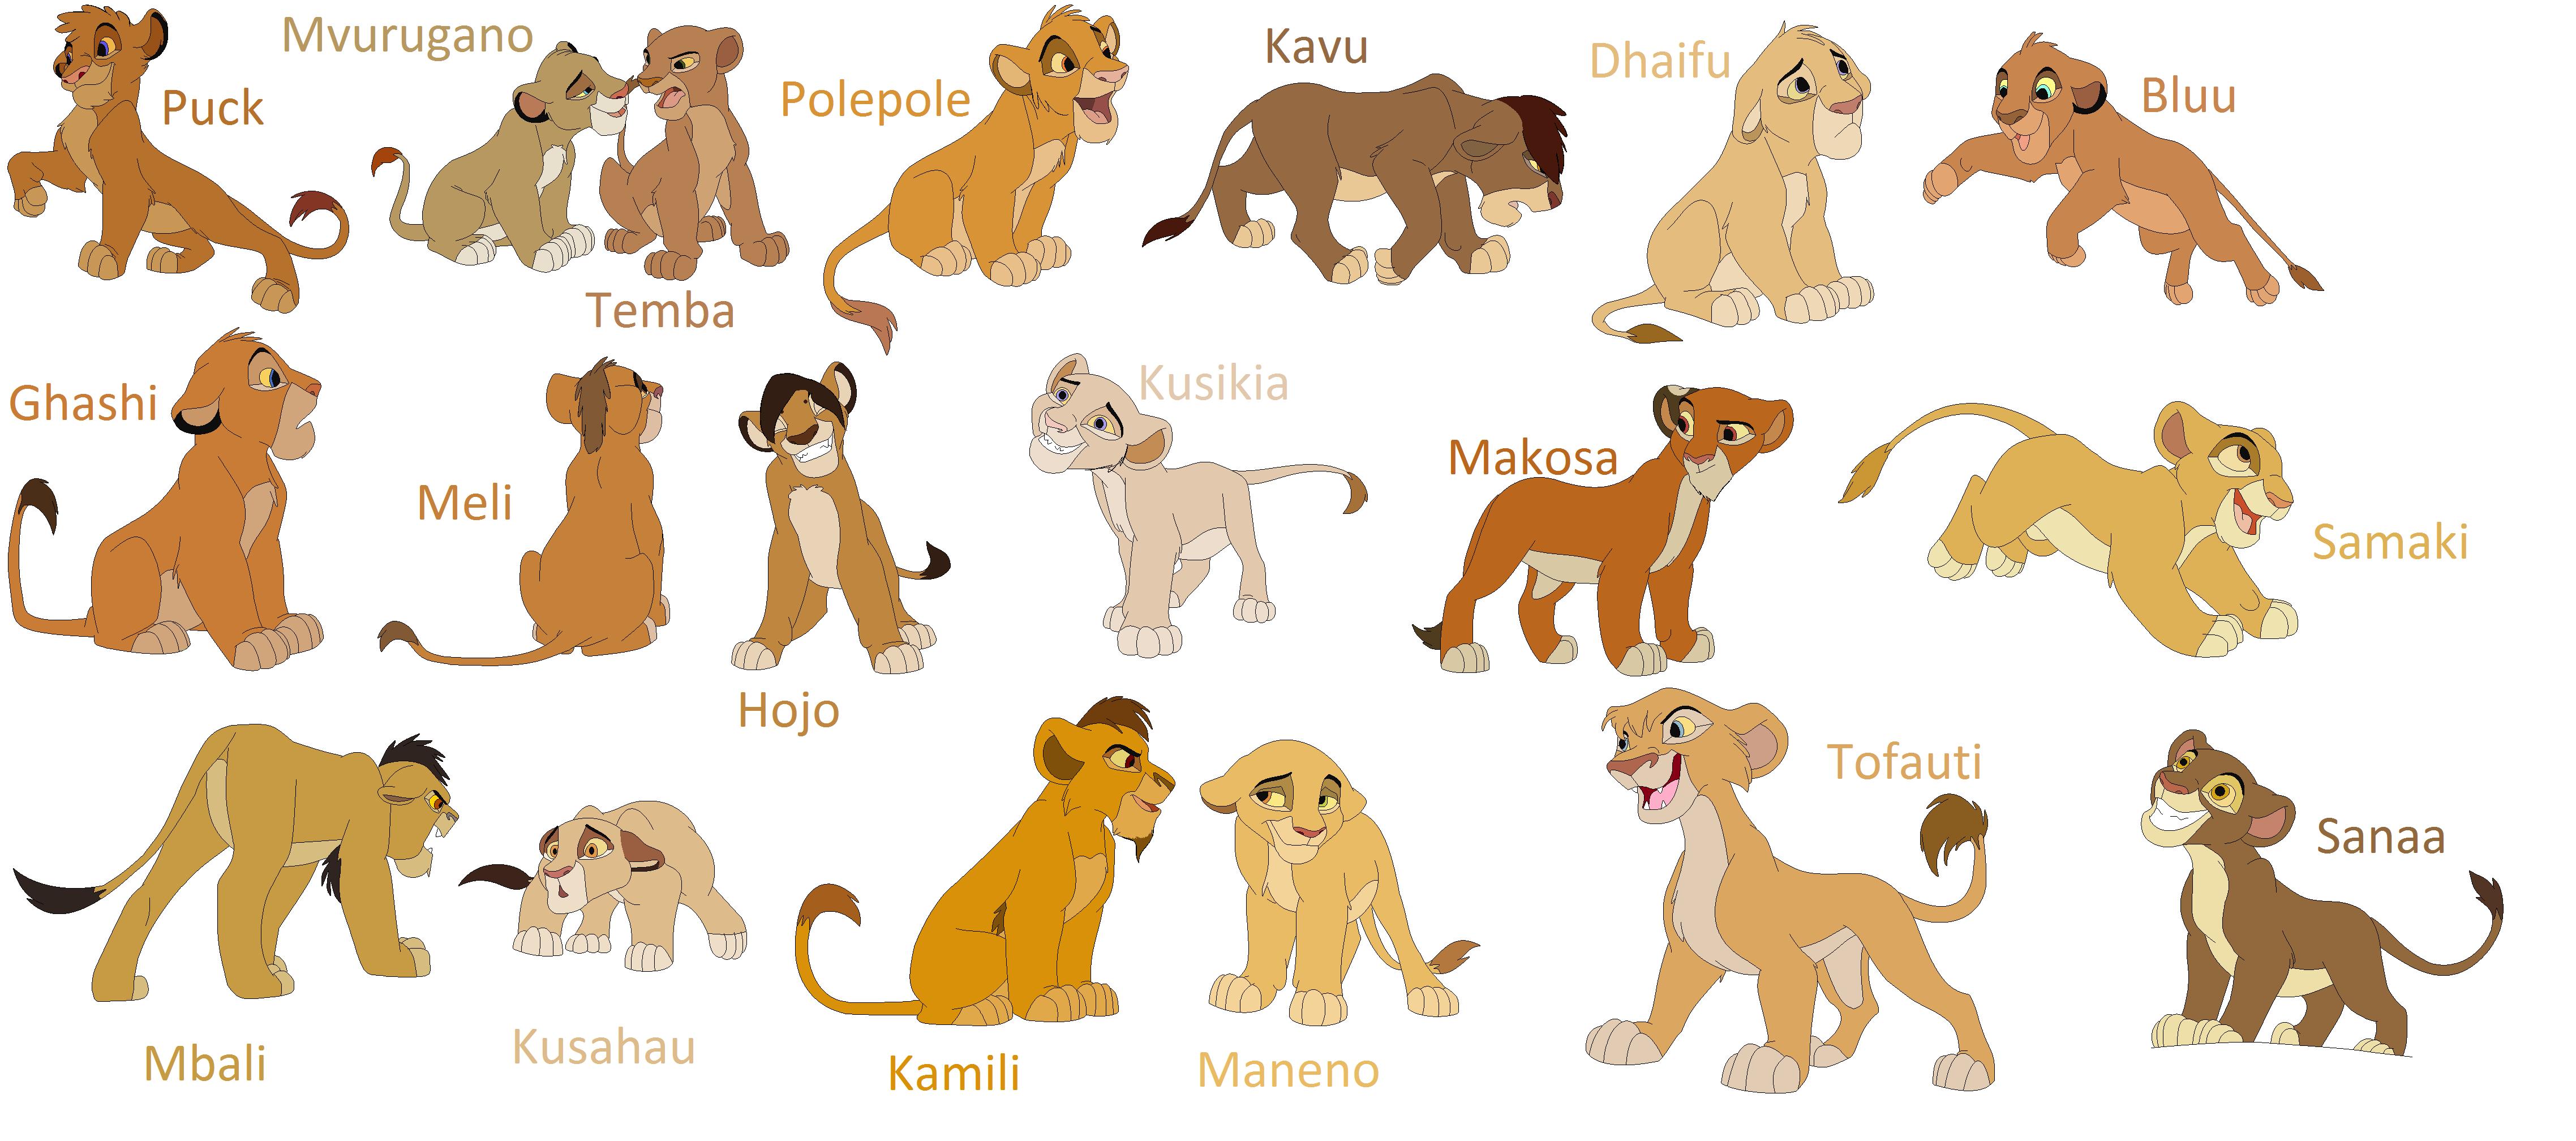 Character Design Lion King : Starting my own lion king fan fic by jusdrein jusdaun on